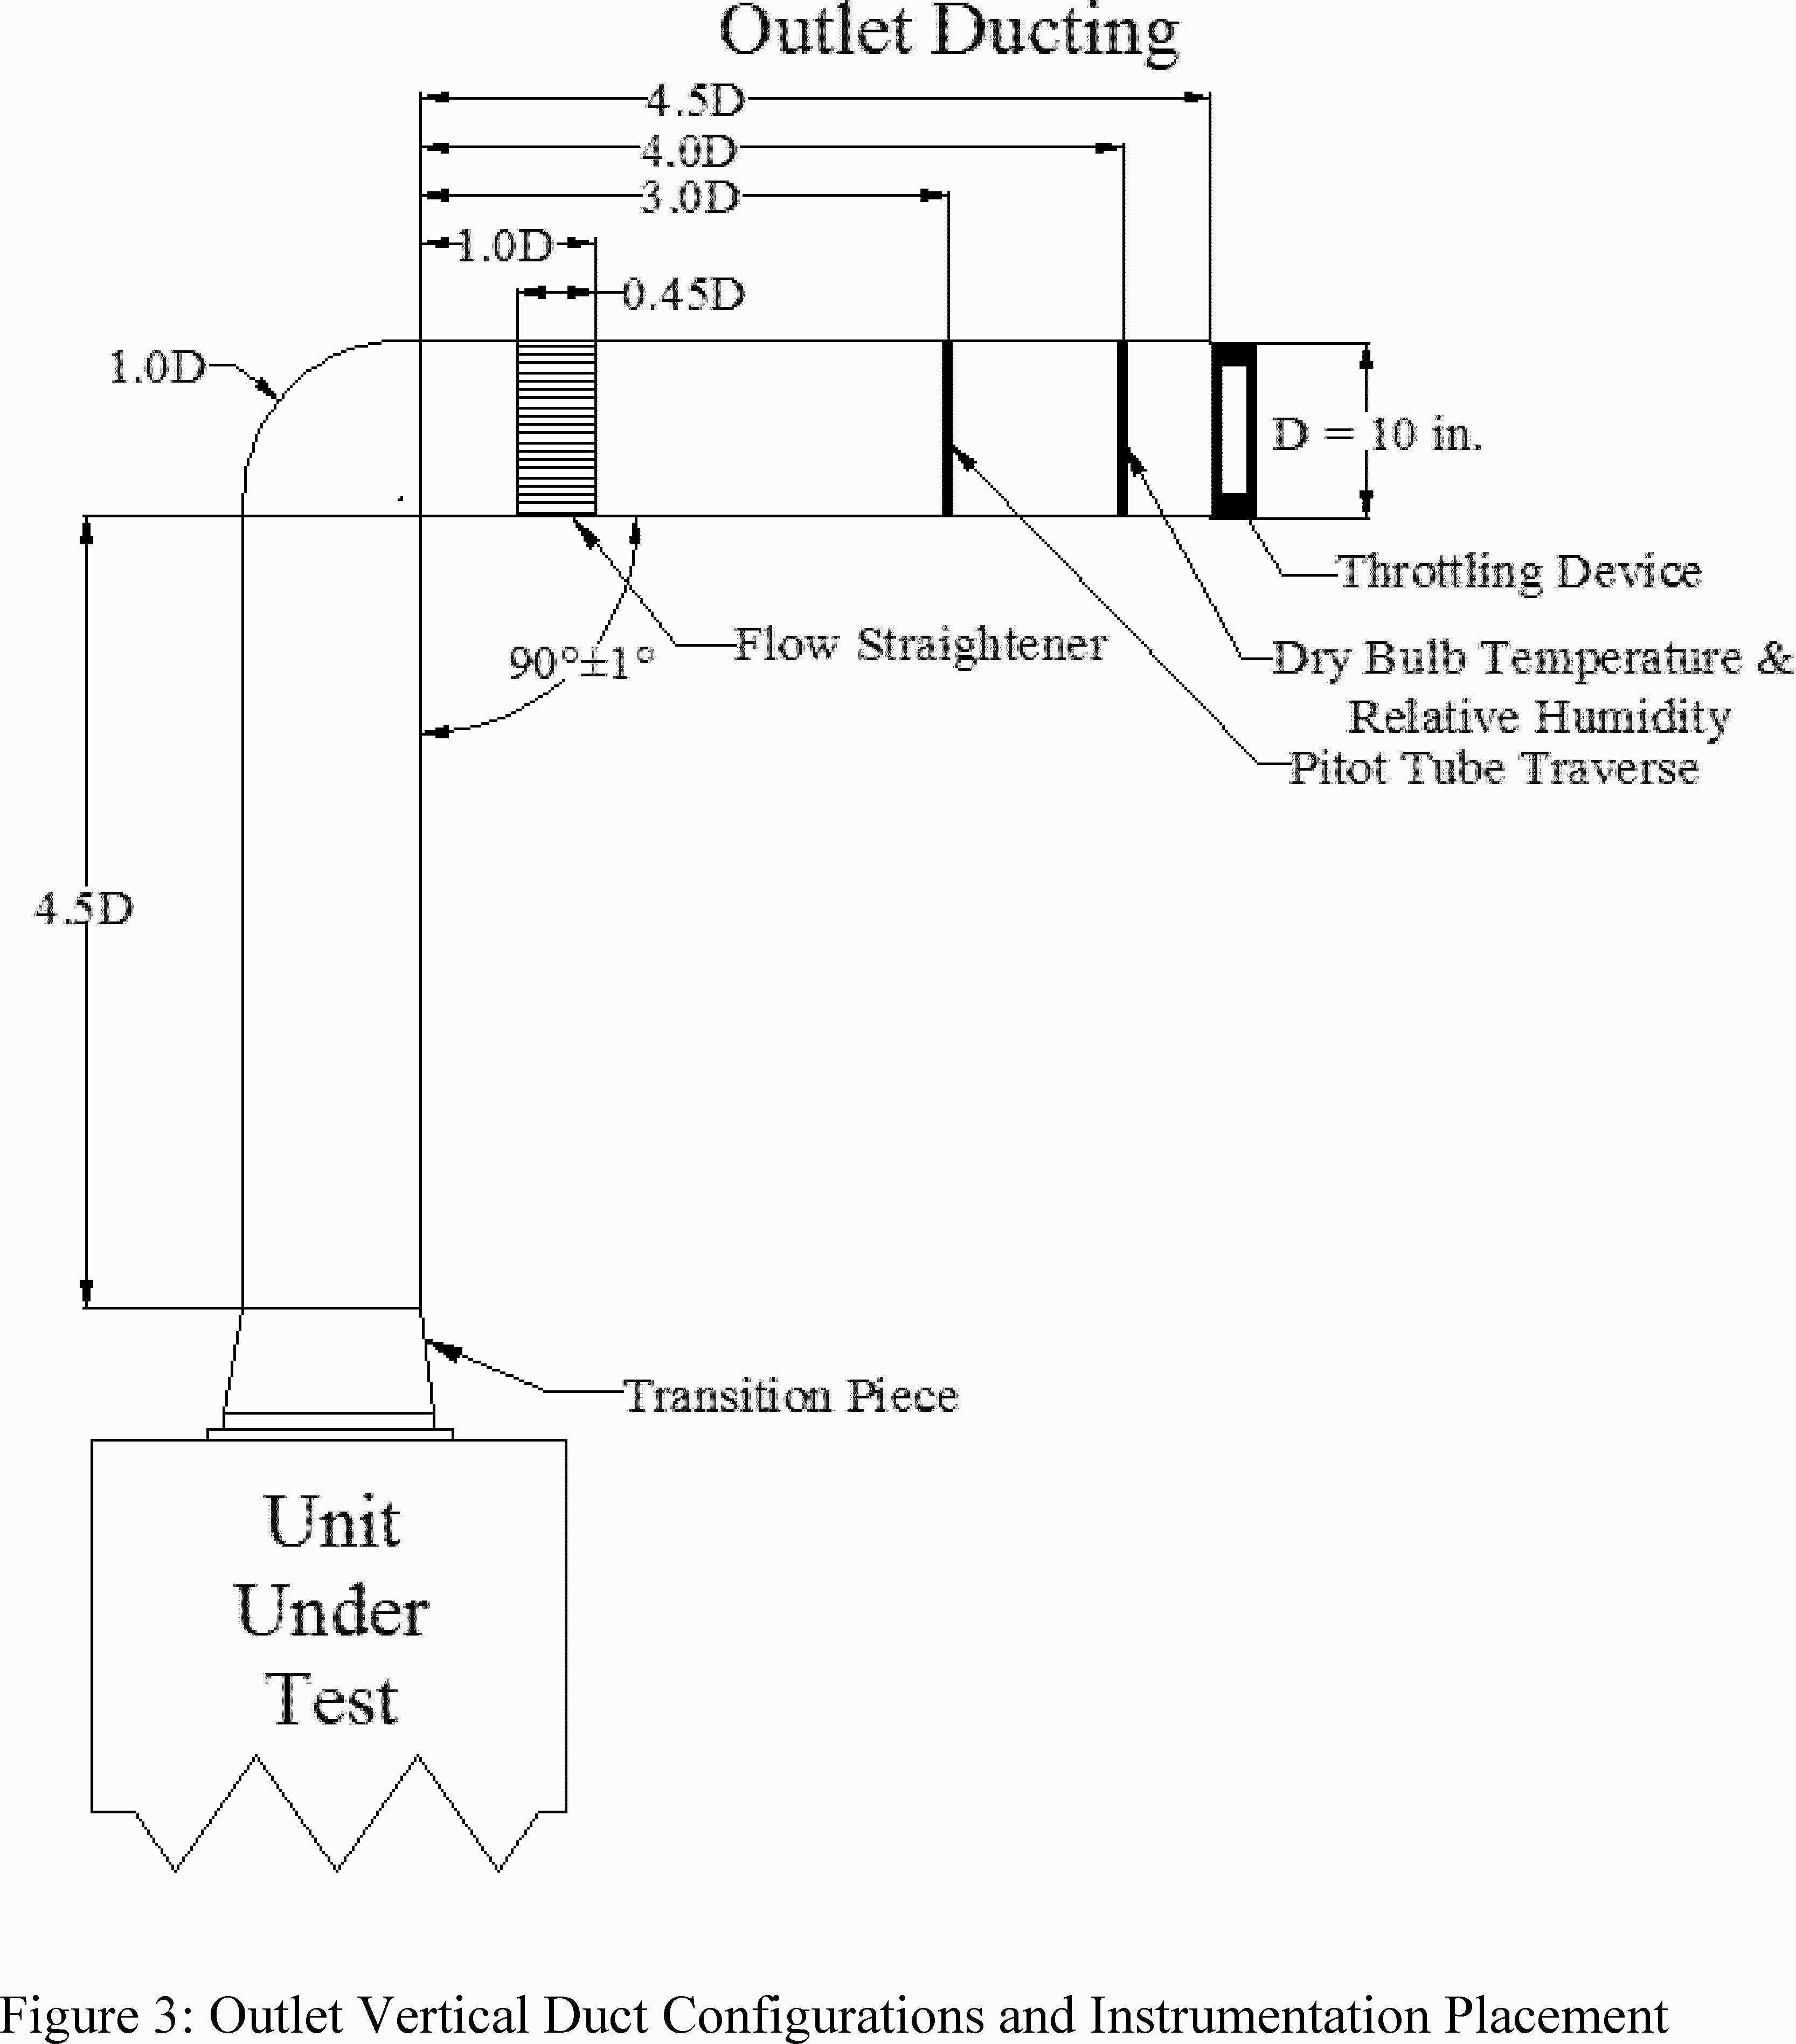 Car Heating System Diagram 38v Wiring Diagram Wiring Diagram Imp Of Car Heating System Diagram